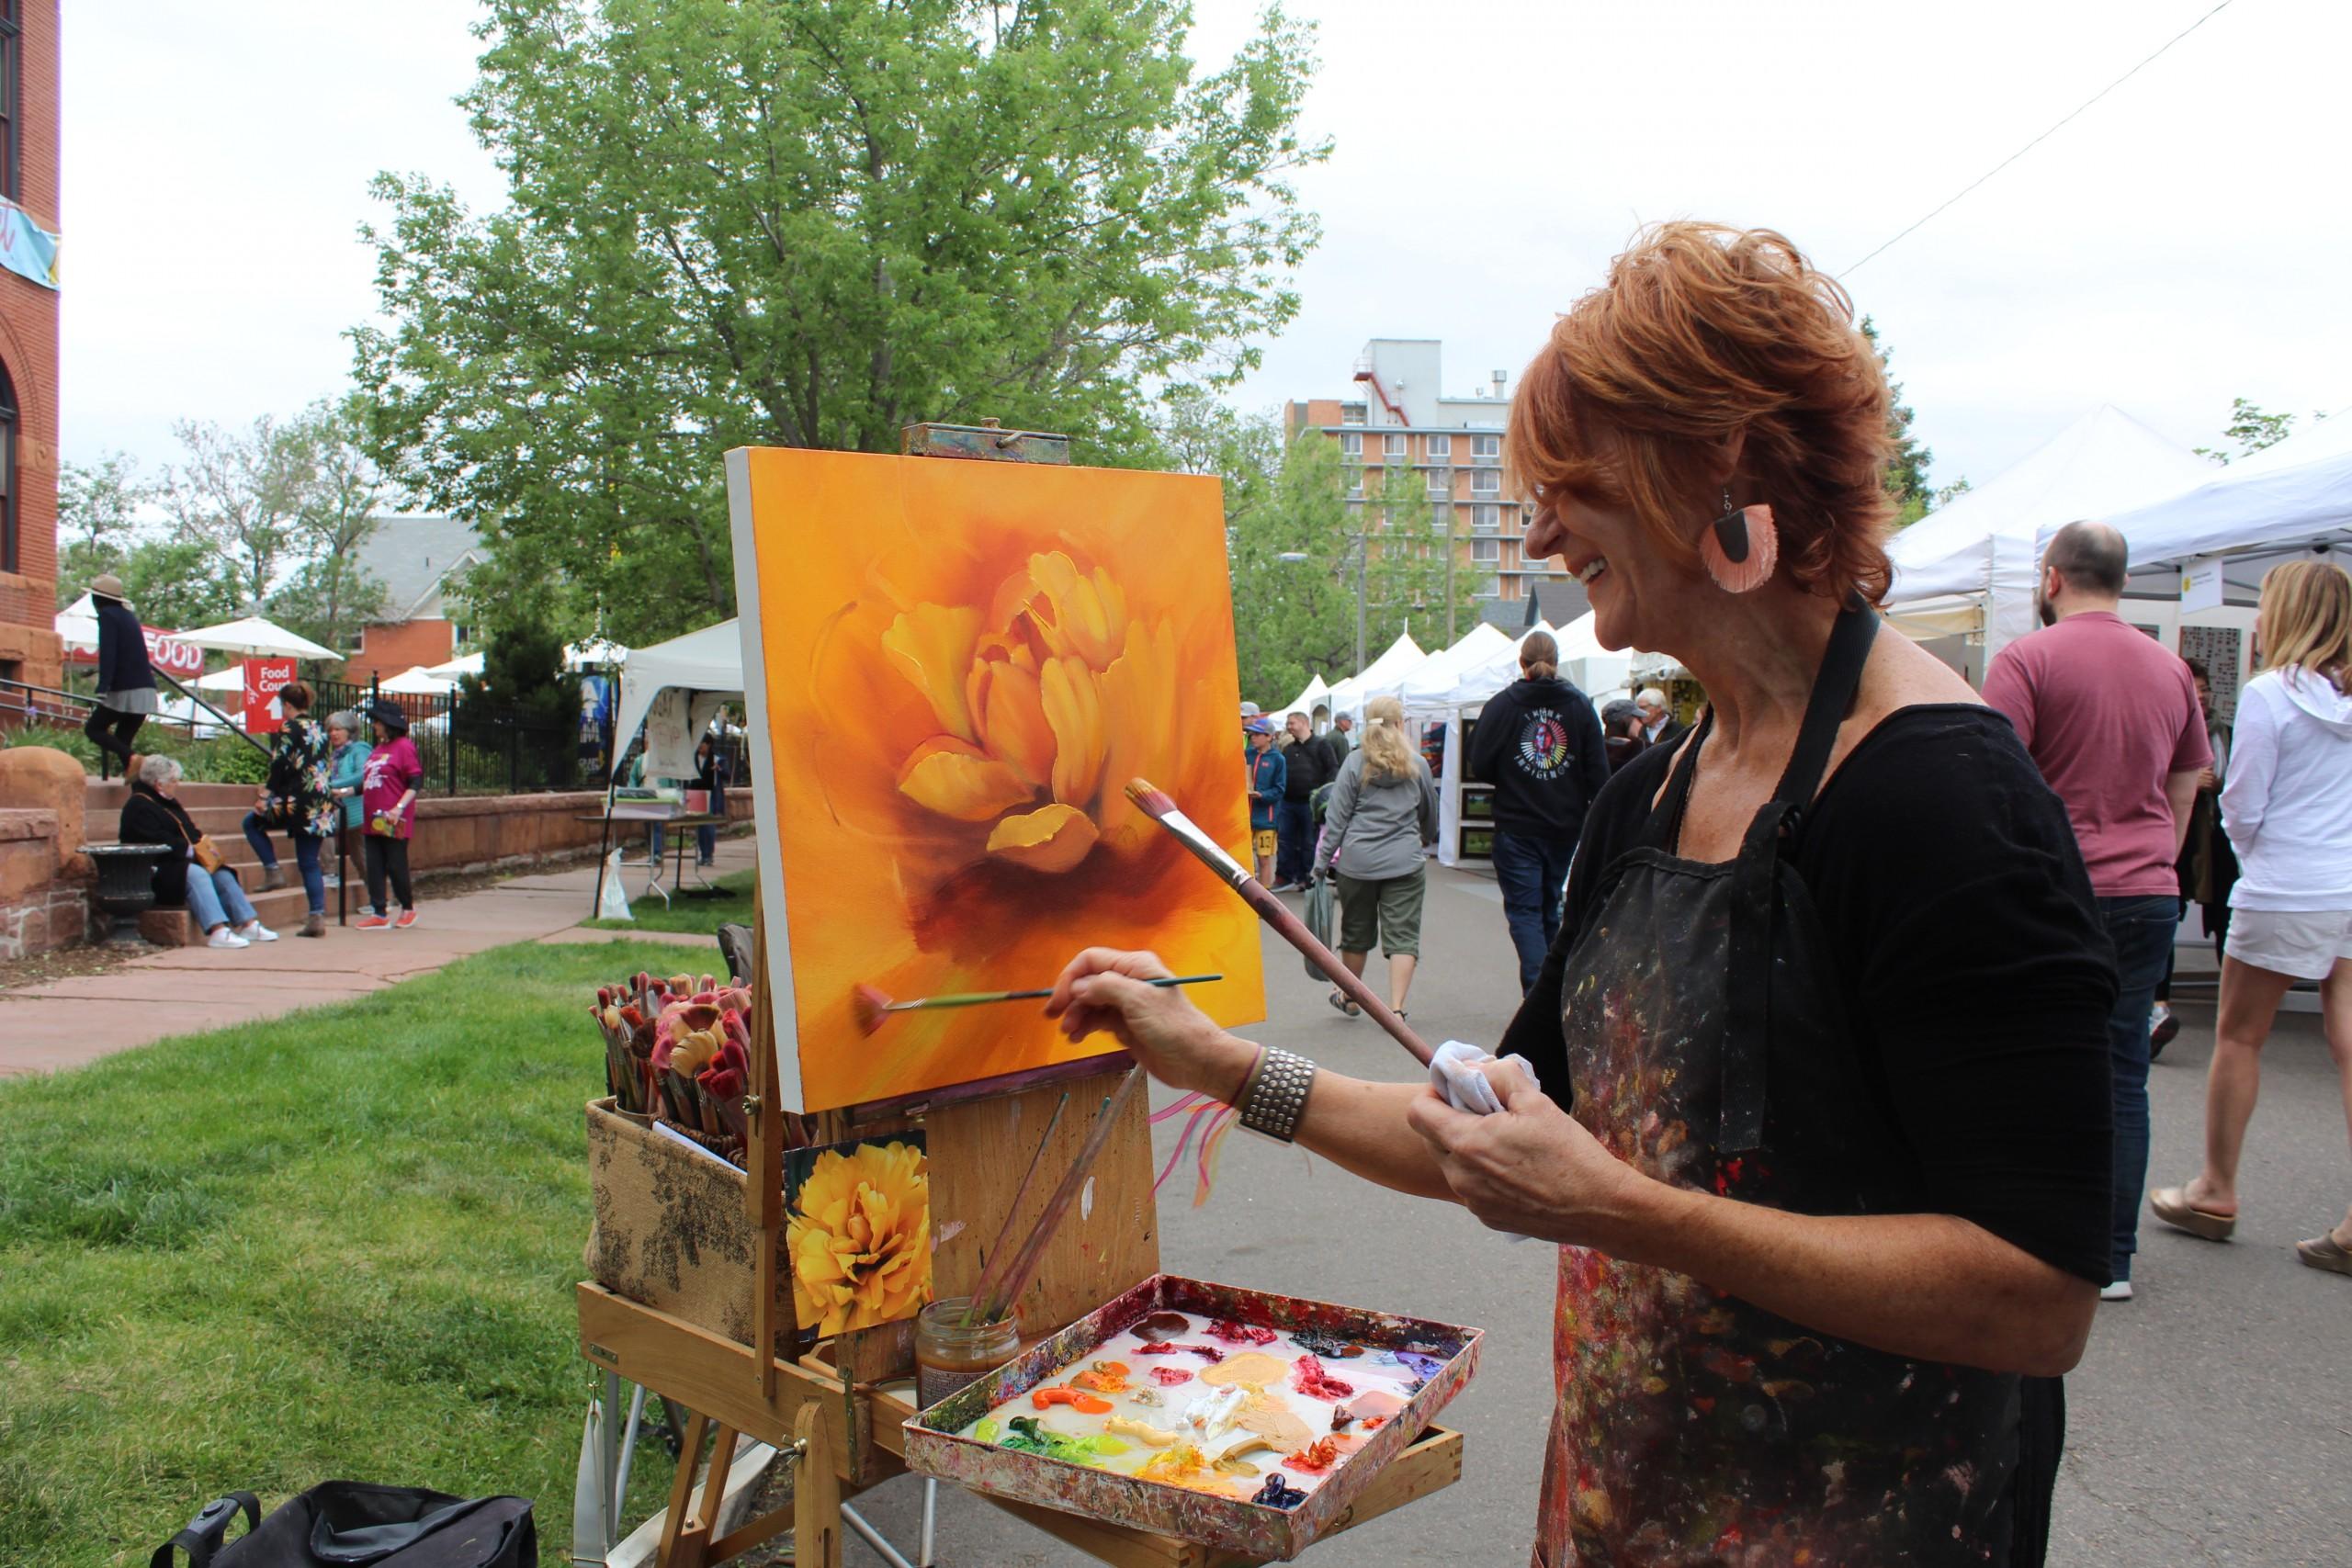 Asld Sam 9 Credit Art Students League Of Denver